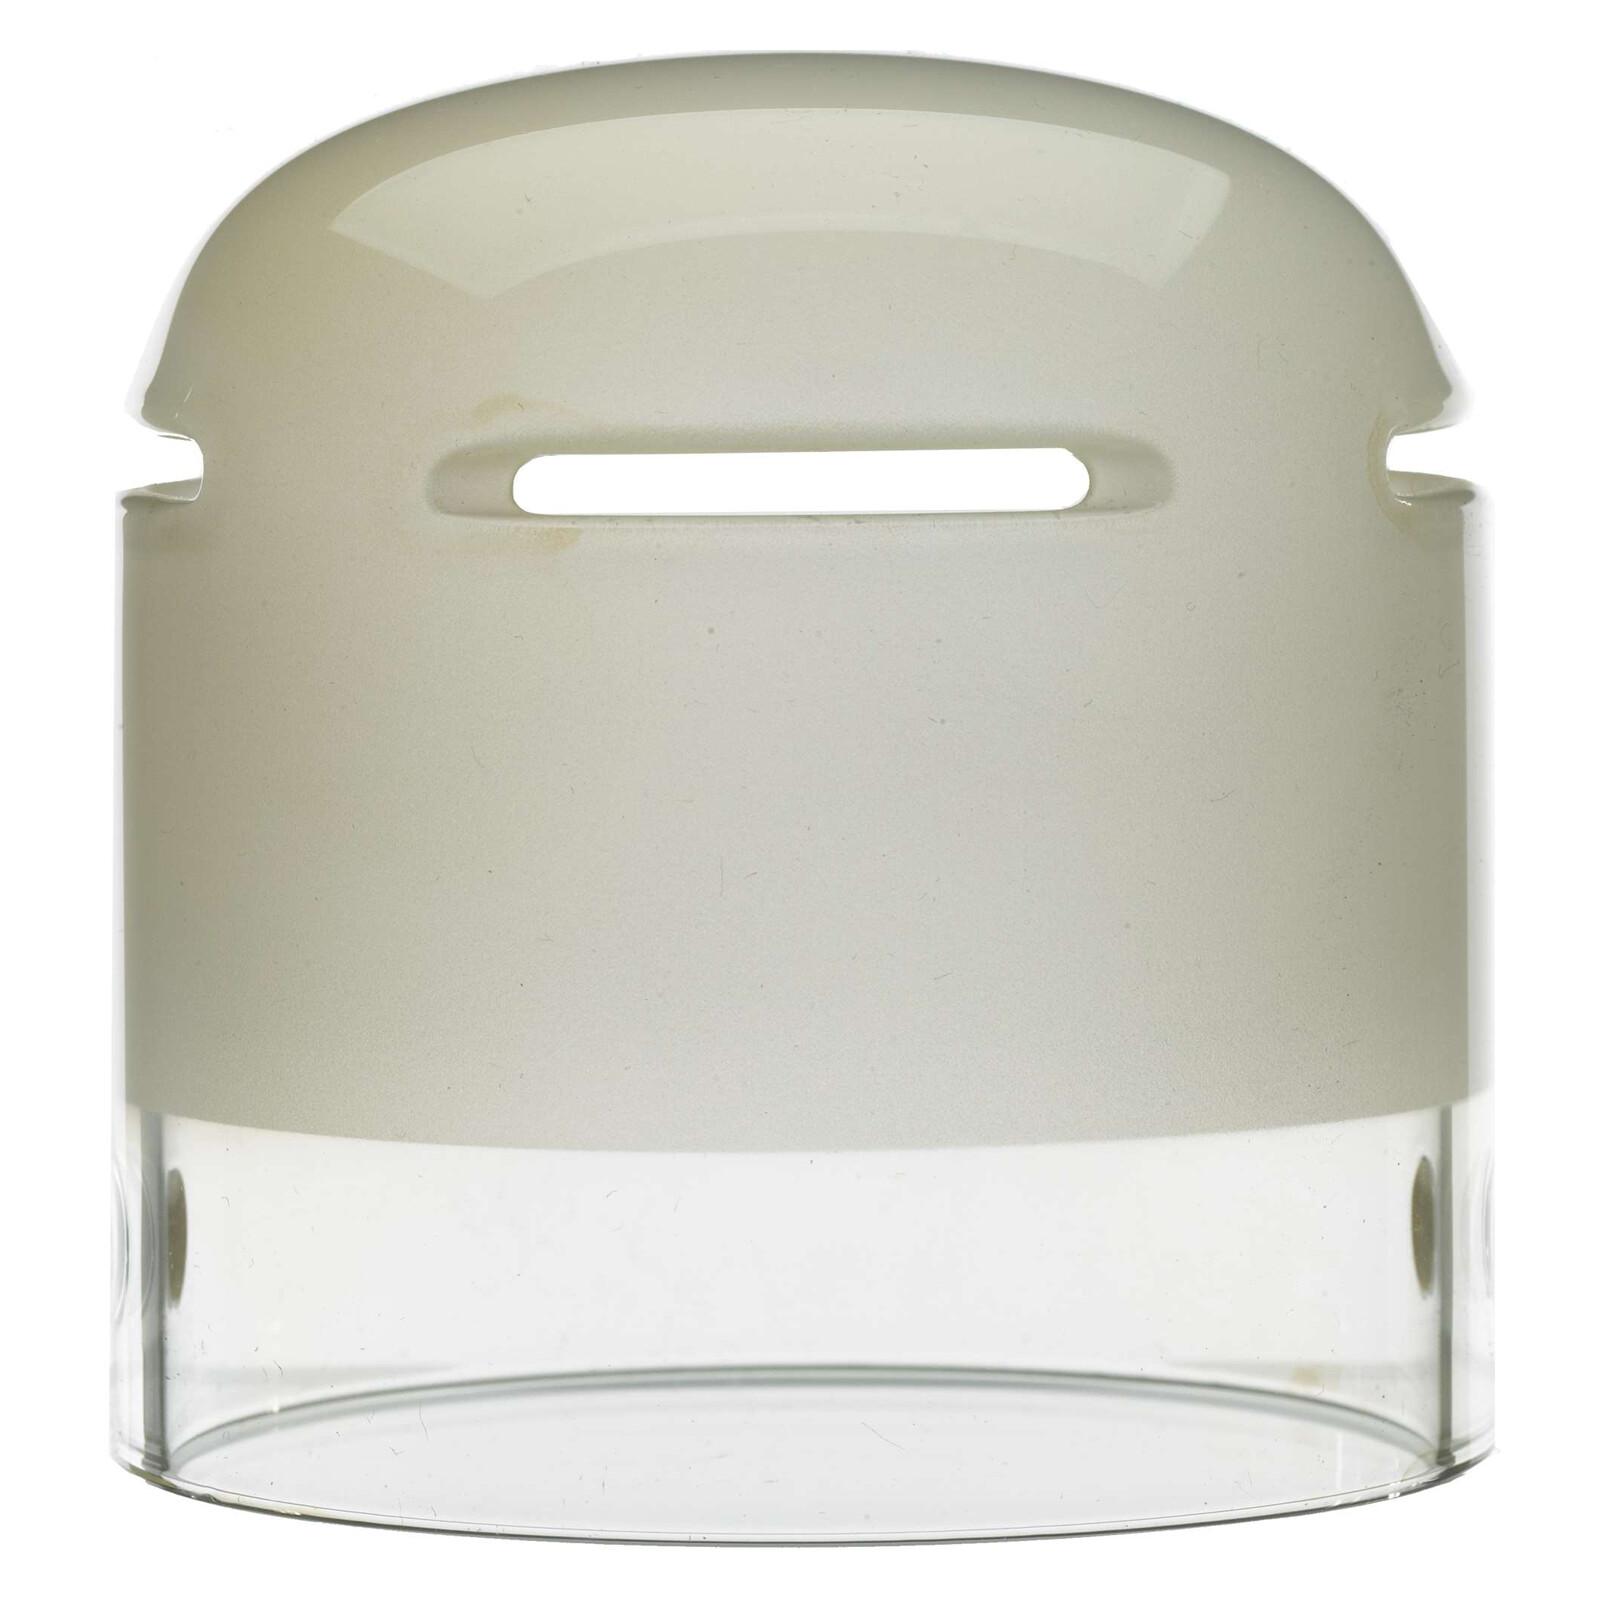 Profoto Schutzglas Plus 75mm Frosted UV 300°K